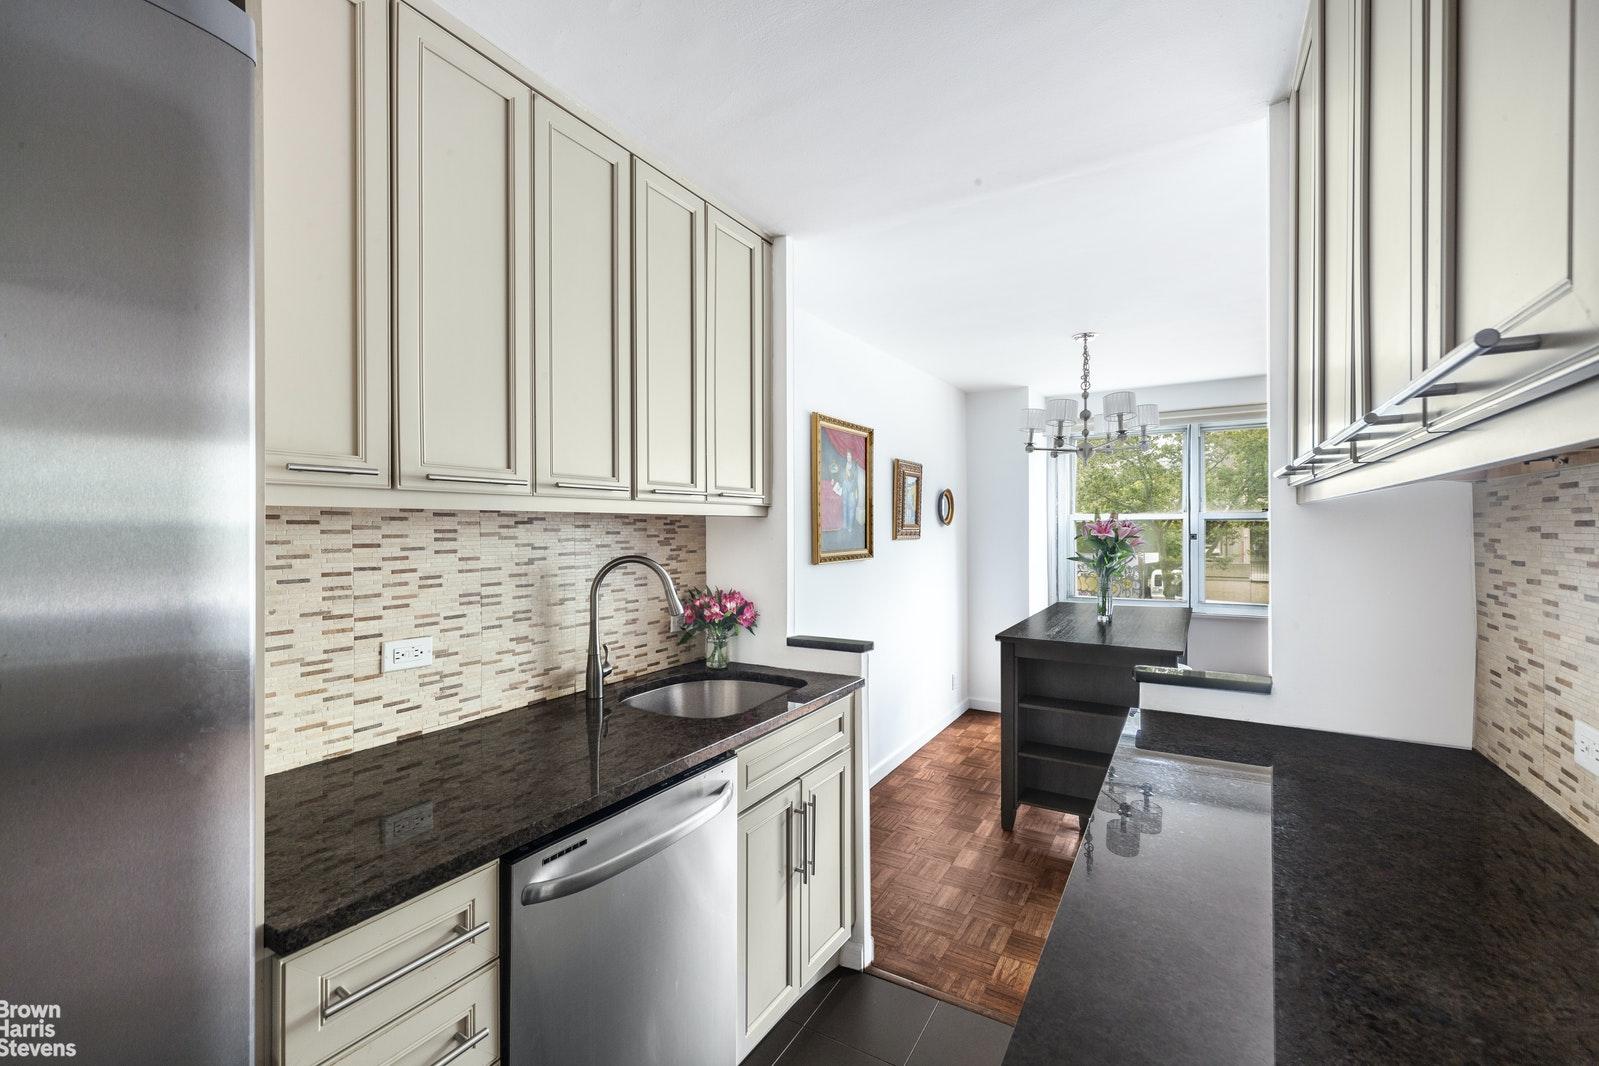 251 EAST 32ND STREET, Murray Hill Kips Bay, $599,000, Web #: 20266503